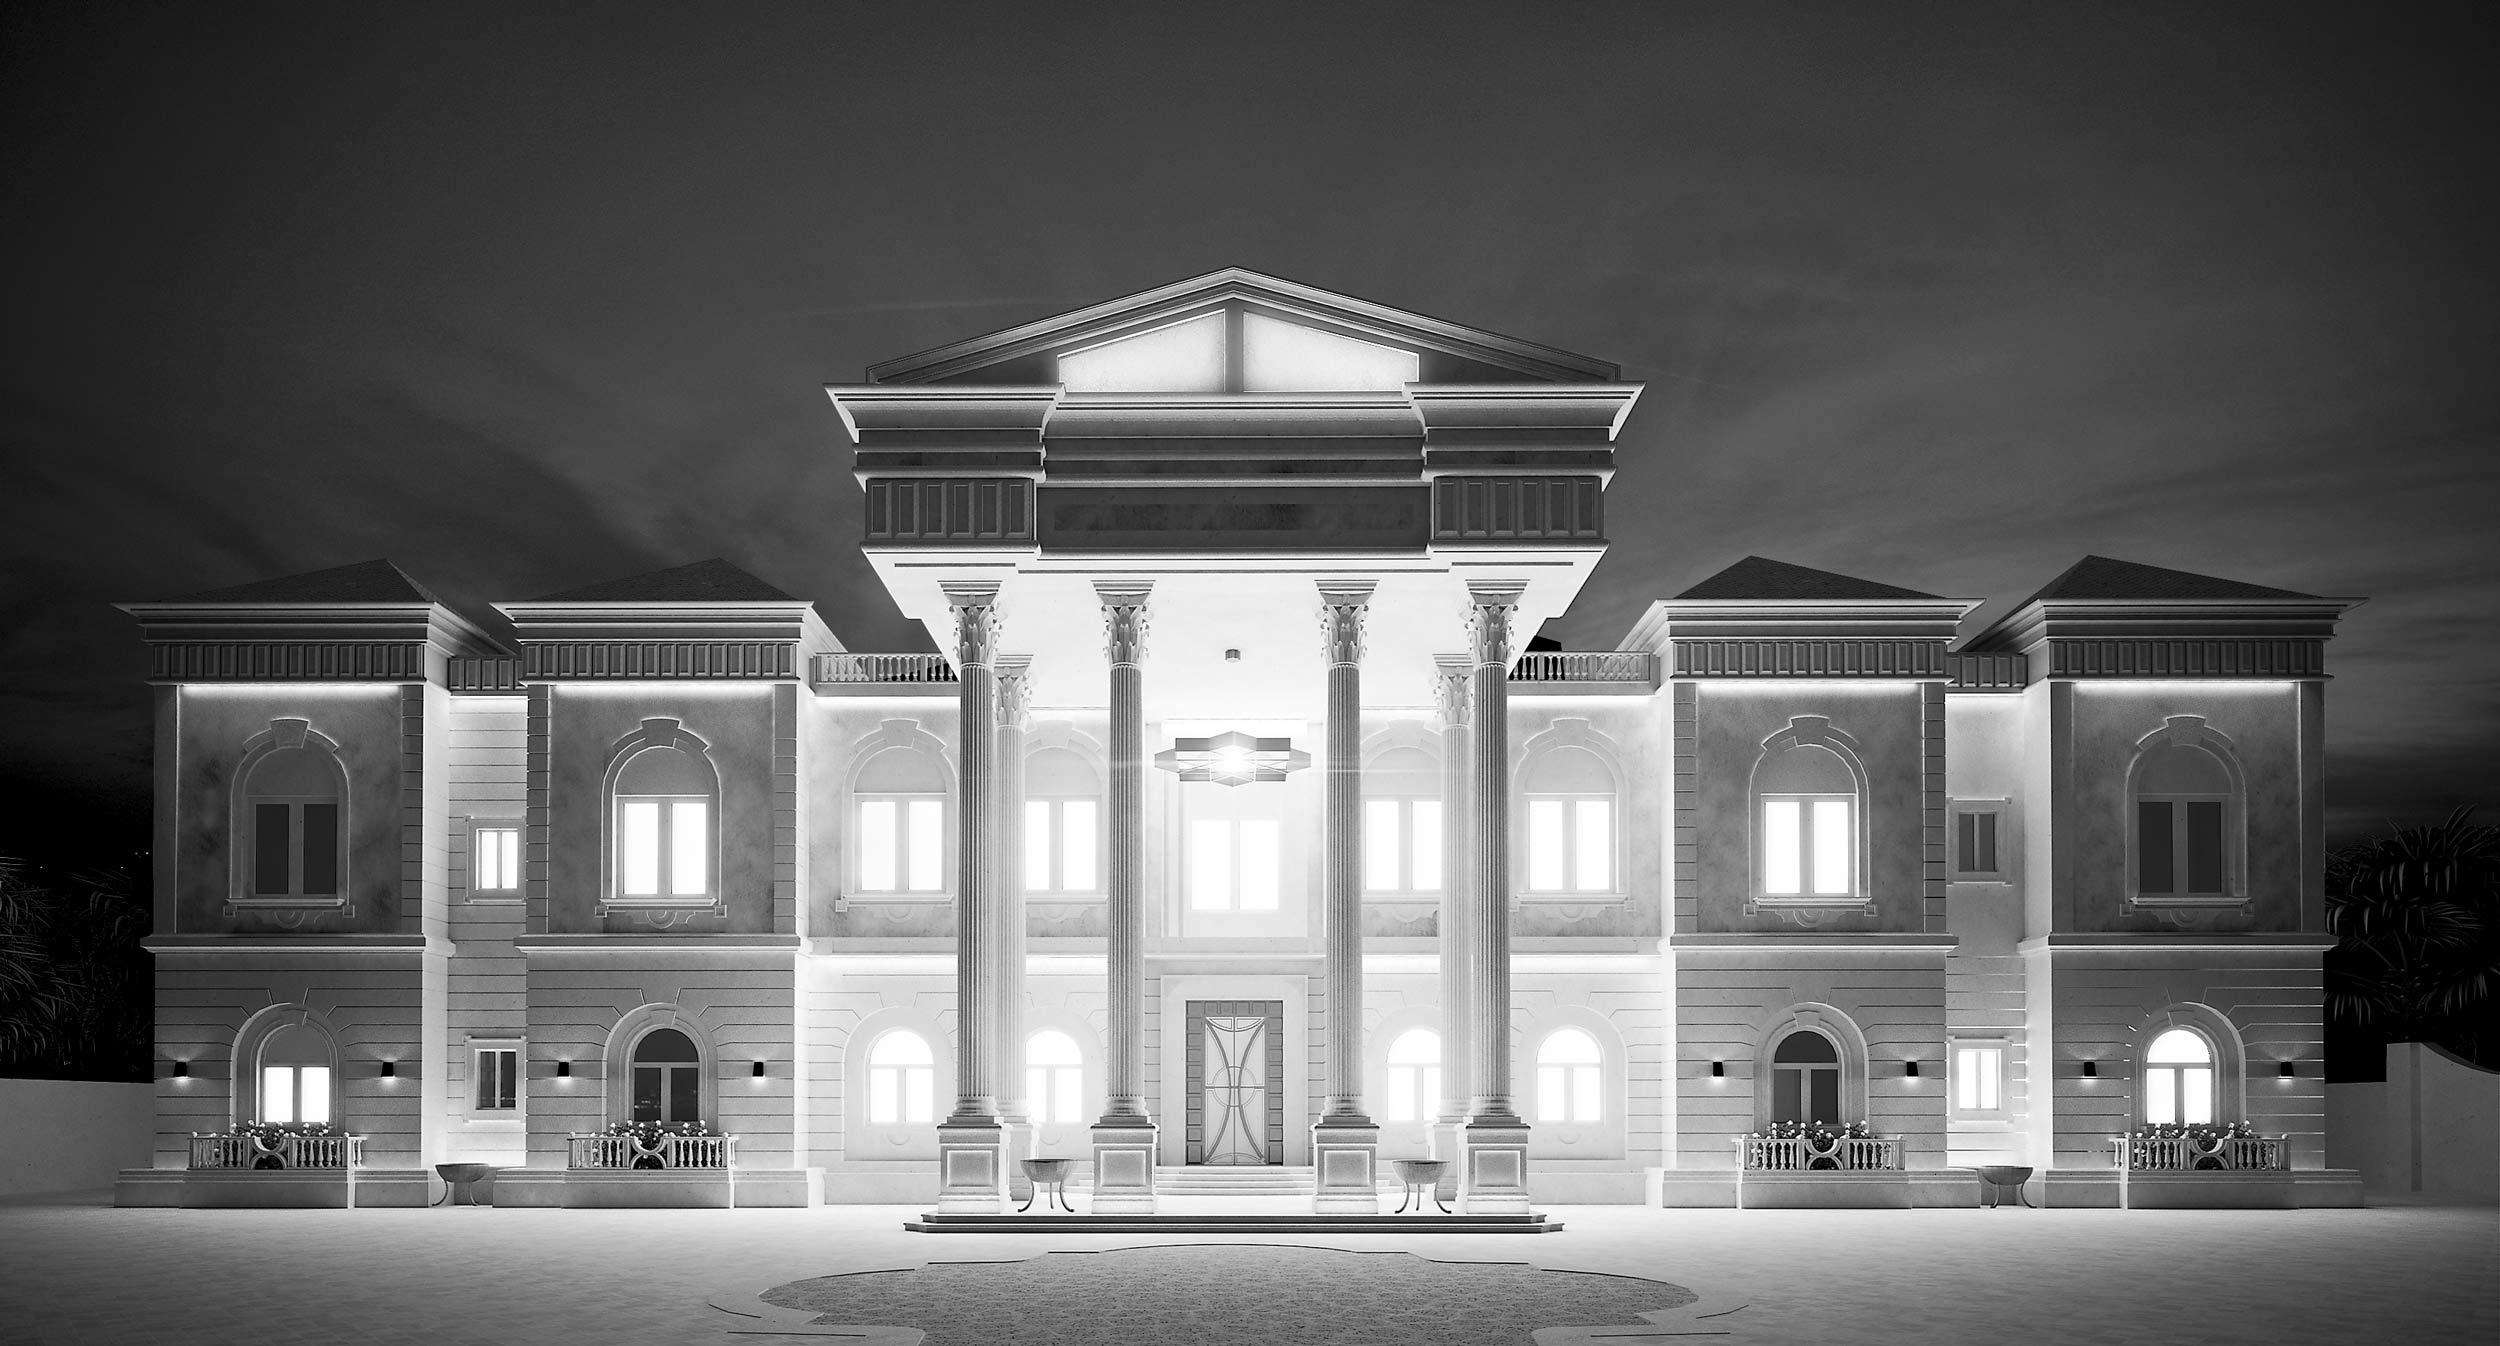 render-qatar-abitazione-privata-villa-illuminazione-notturna-night-classic